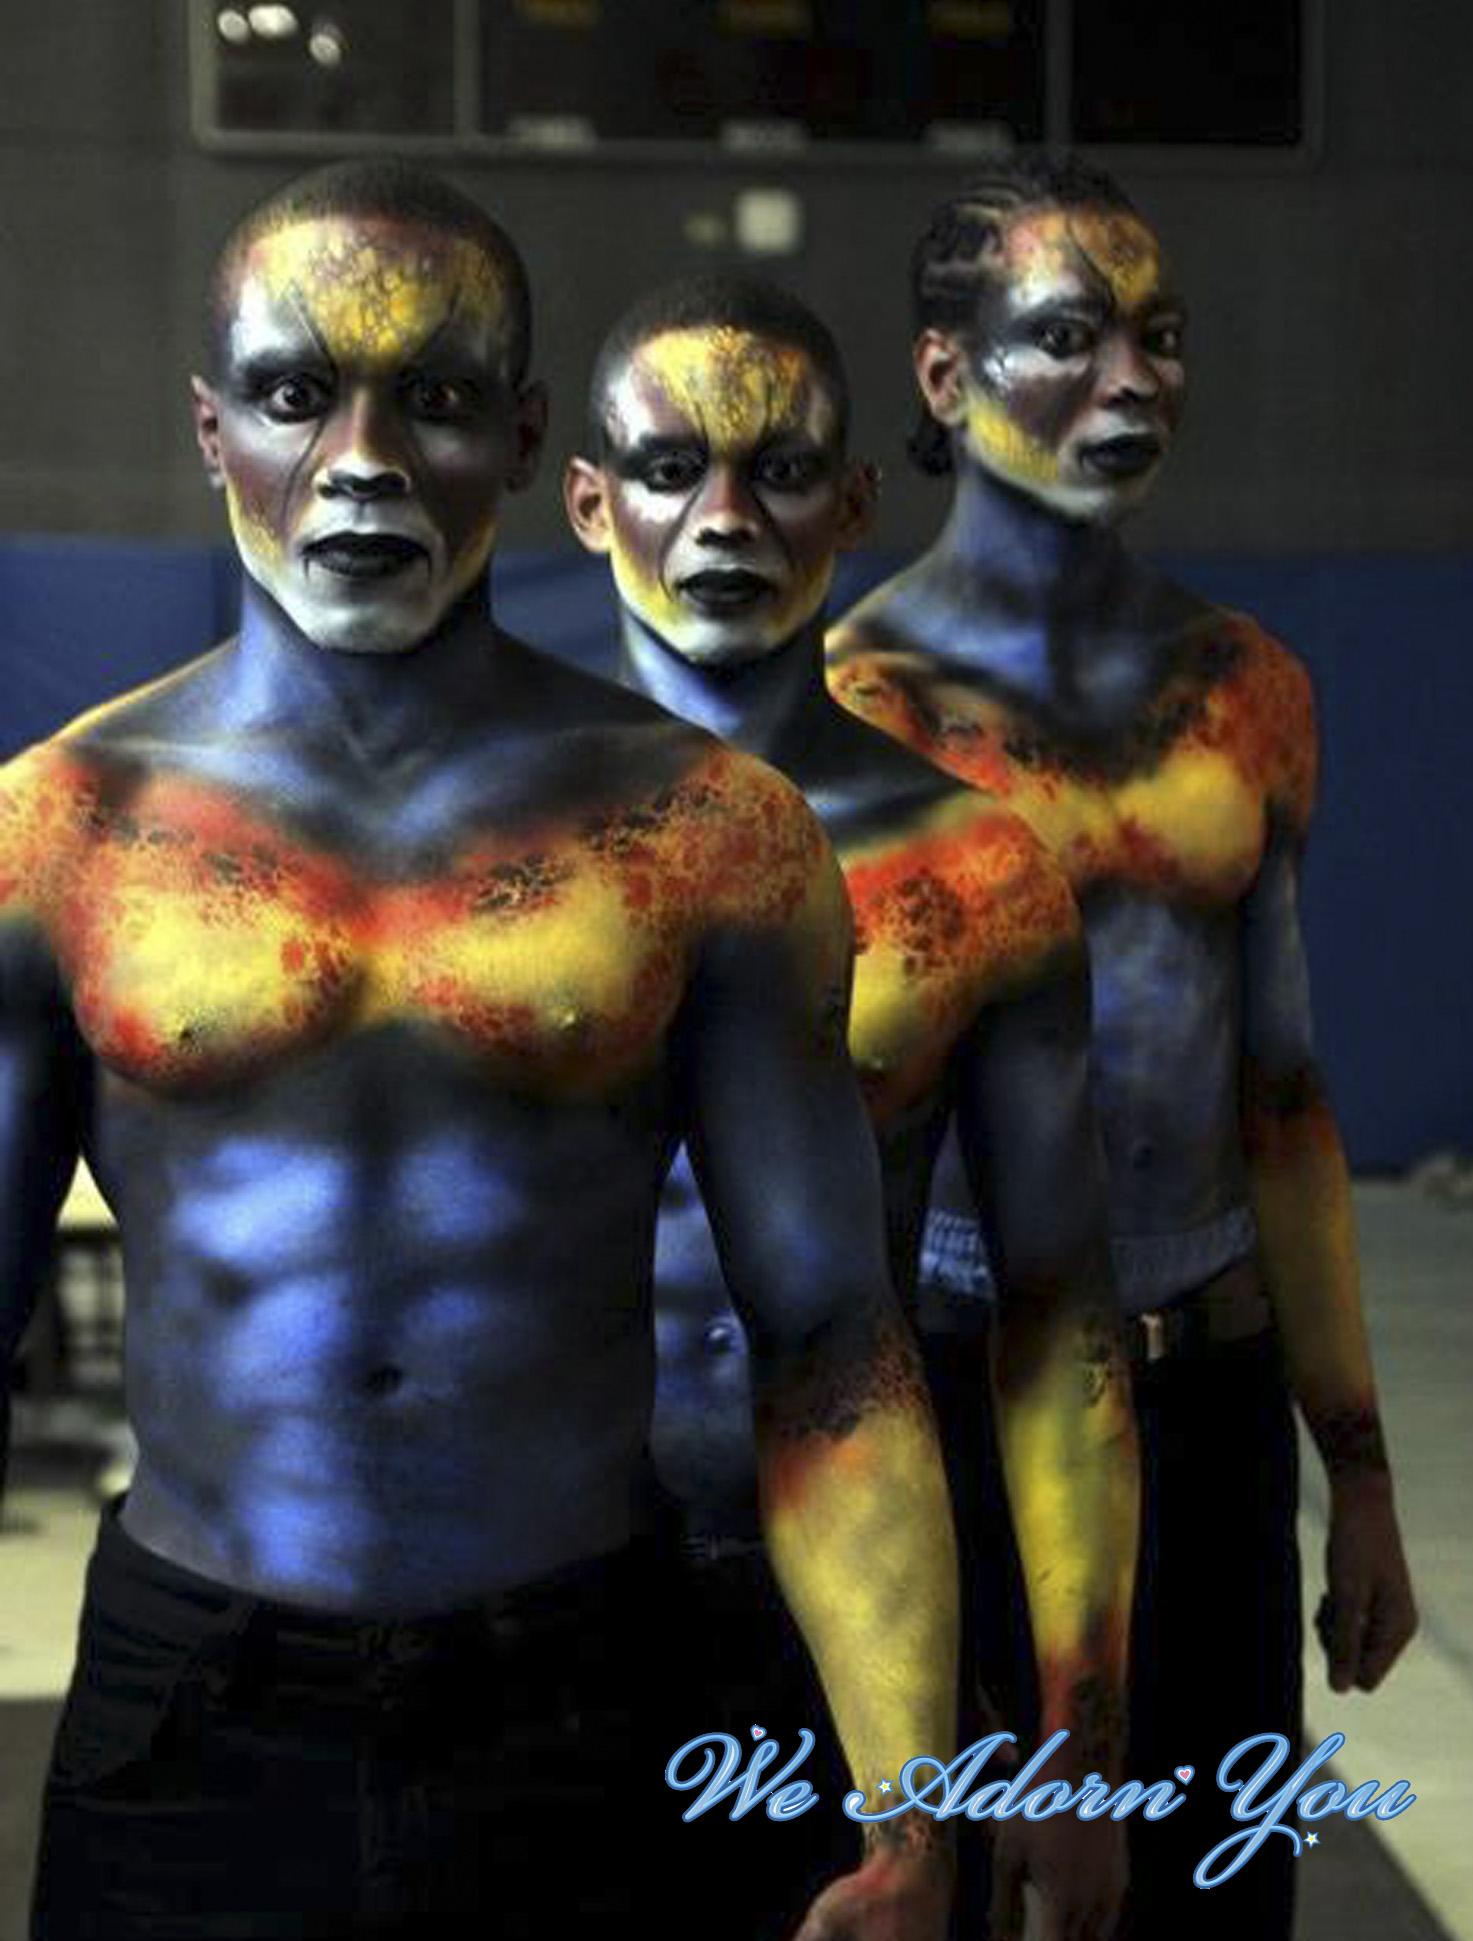 Body Painting NYU - We Adorn You.jpg